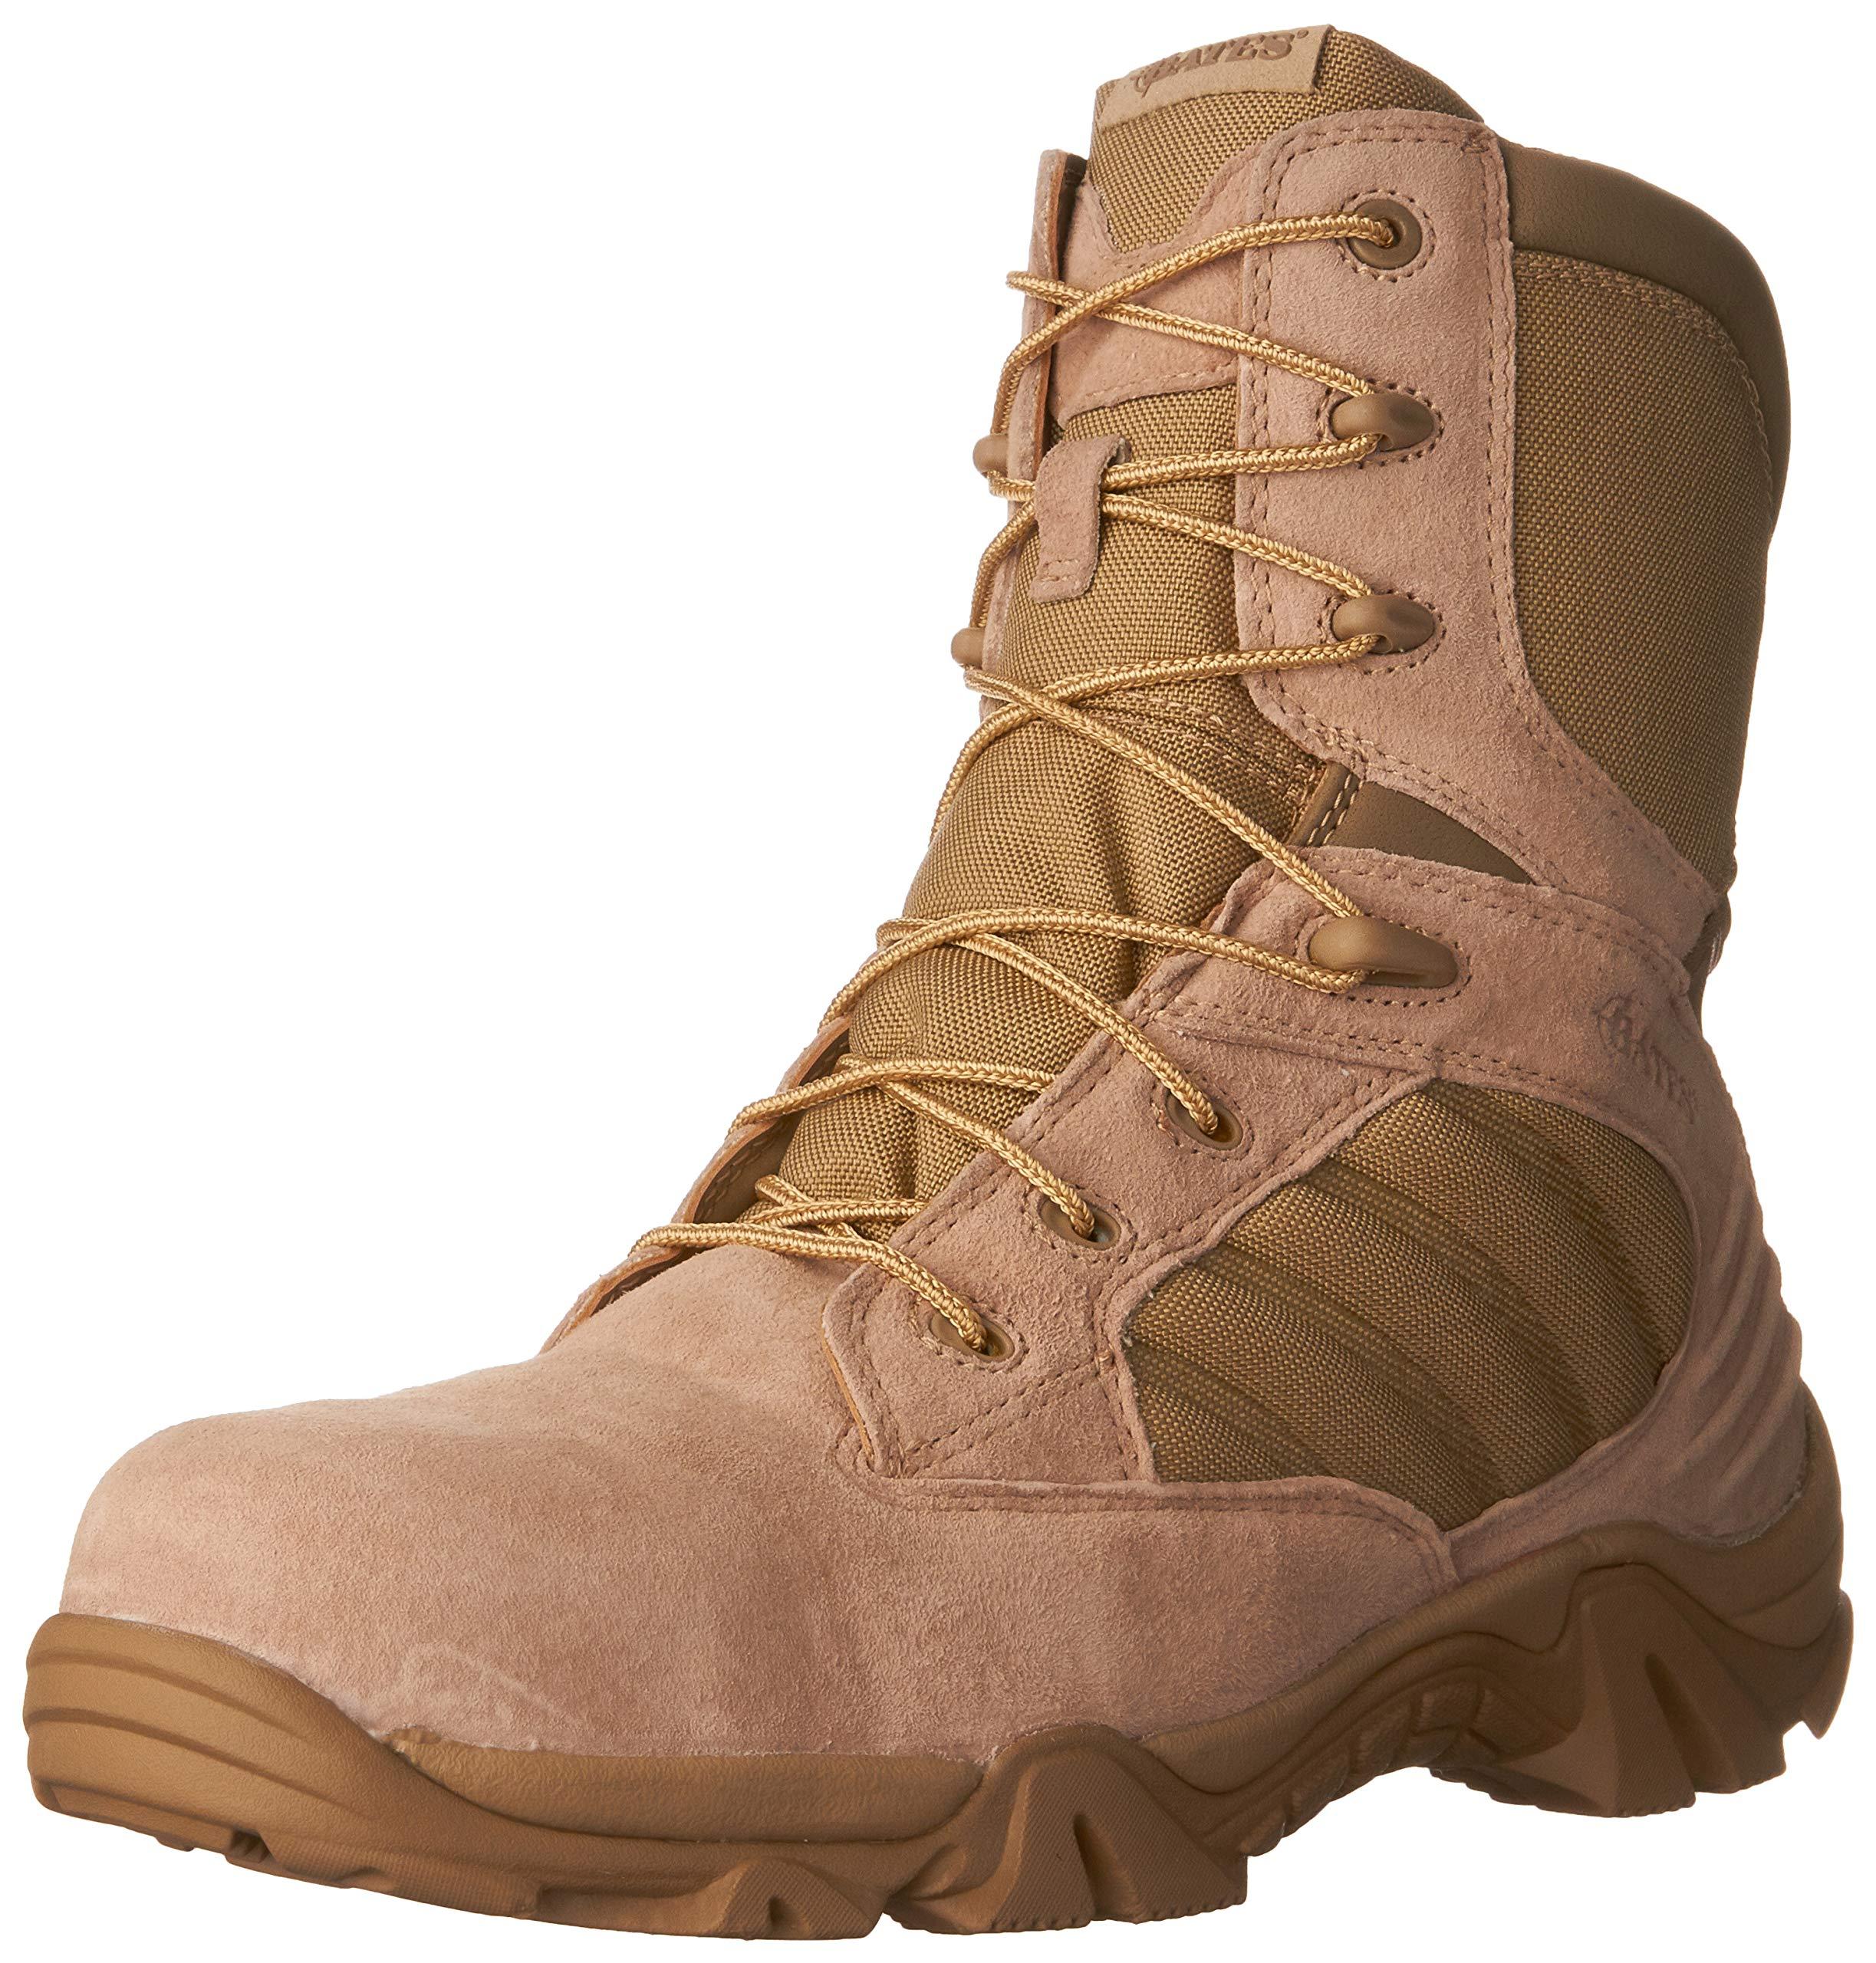 Bates Men's GX-8 8 Inch Ultra-Lites Zip Uniform Work Boot, Desert, 10.5 M US by Bates